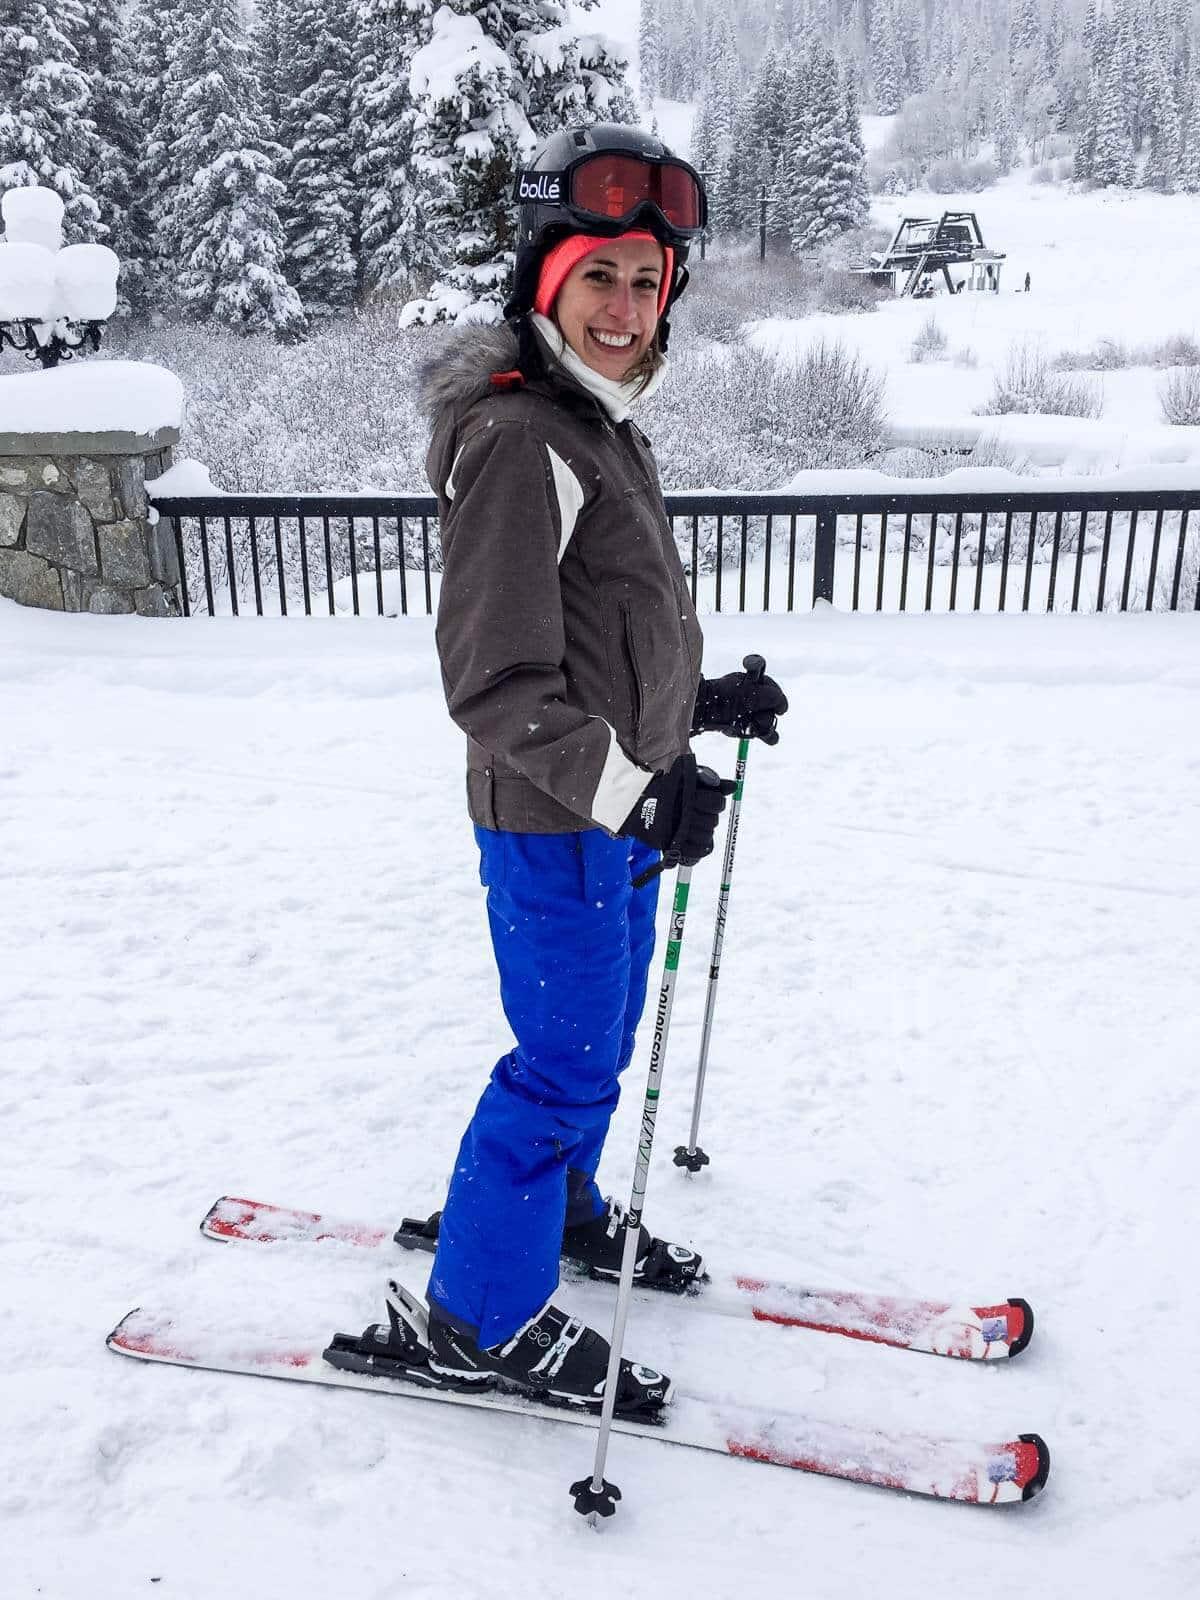 Skiing at Solitude Resort